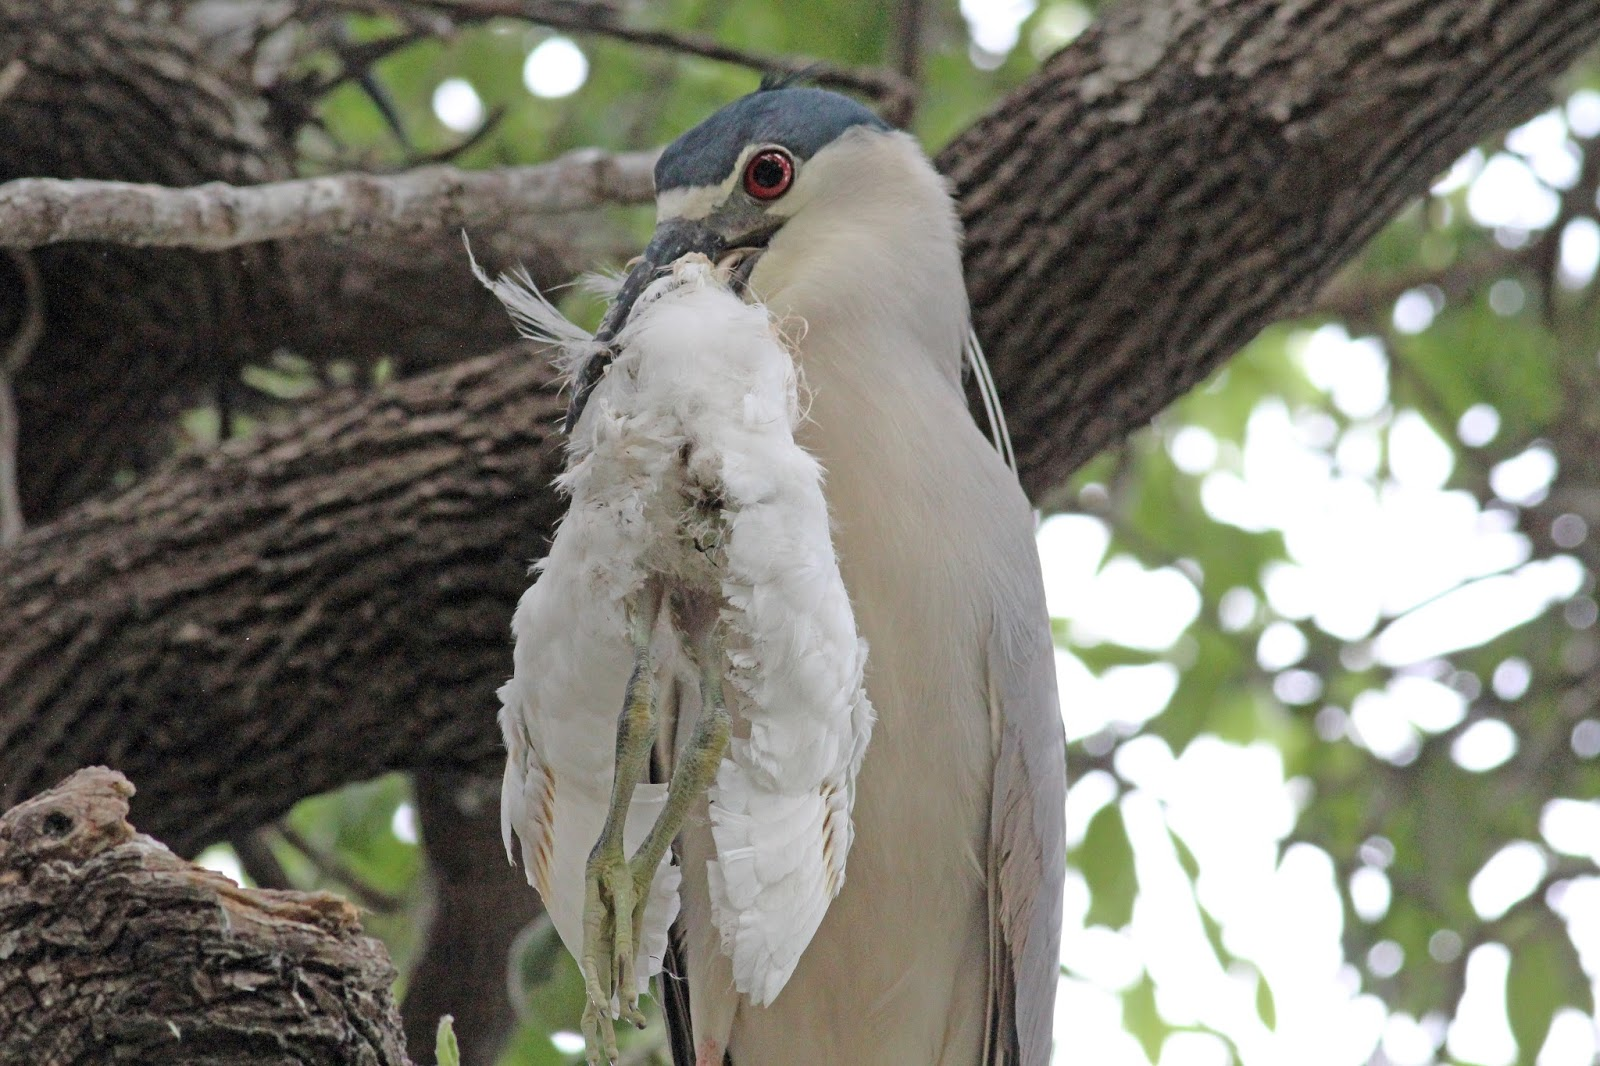 http://4.bp.blogspot.com/-YkO0GrFm0AI/UgfPtjk-AsI/AAAAAAAAIJ8/4bFP1rUcAfc/s1600/night+heron+eating+bird.jpg